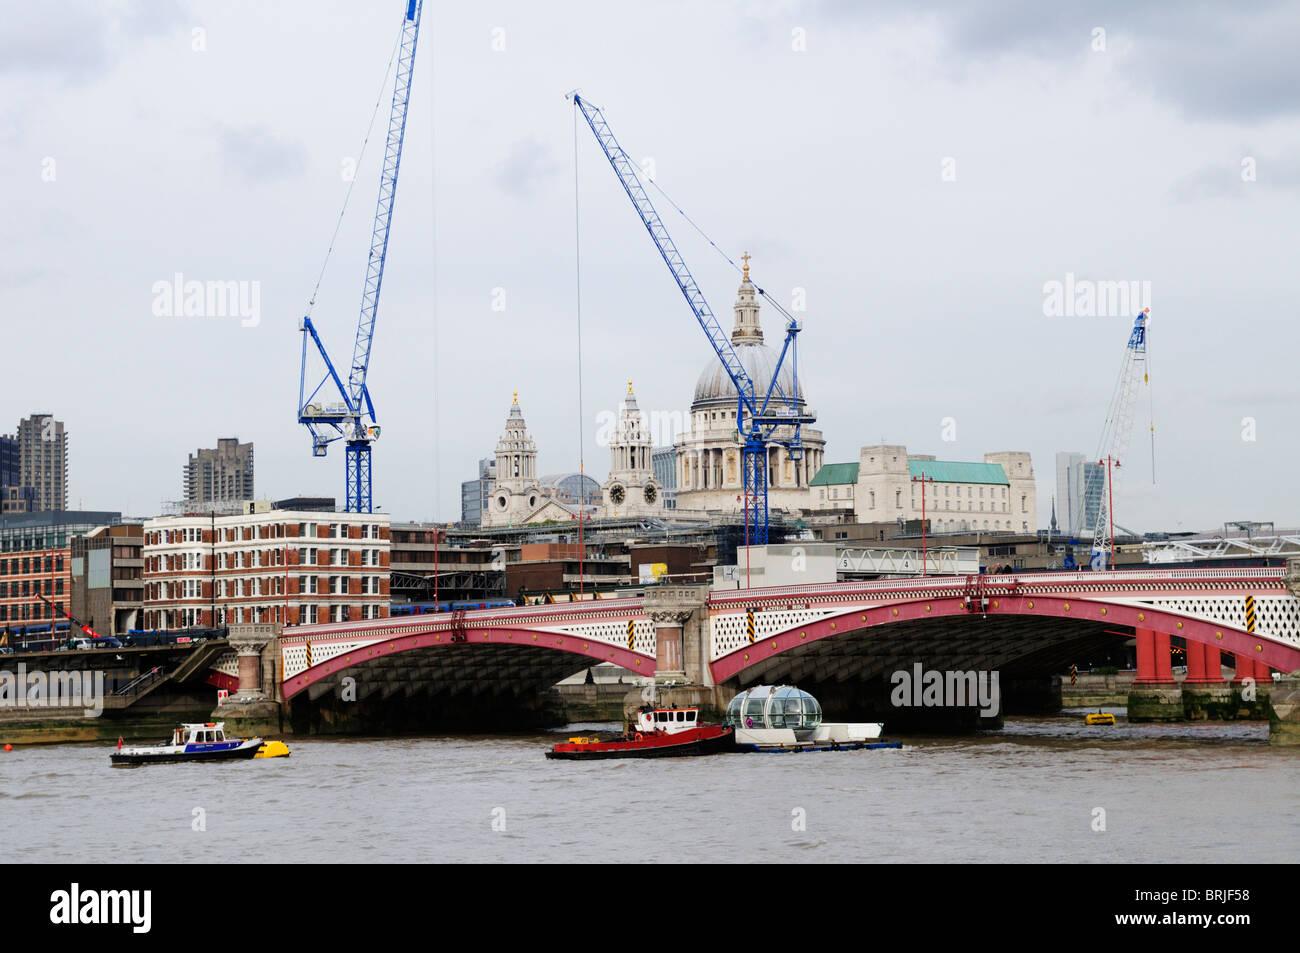 London Eye Beobachtung Kapsel beförderten auf der Themse an der Blackfriars Bridge, London, England, UK Stockbild